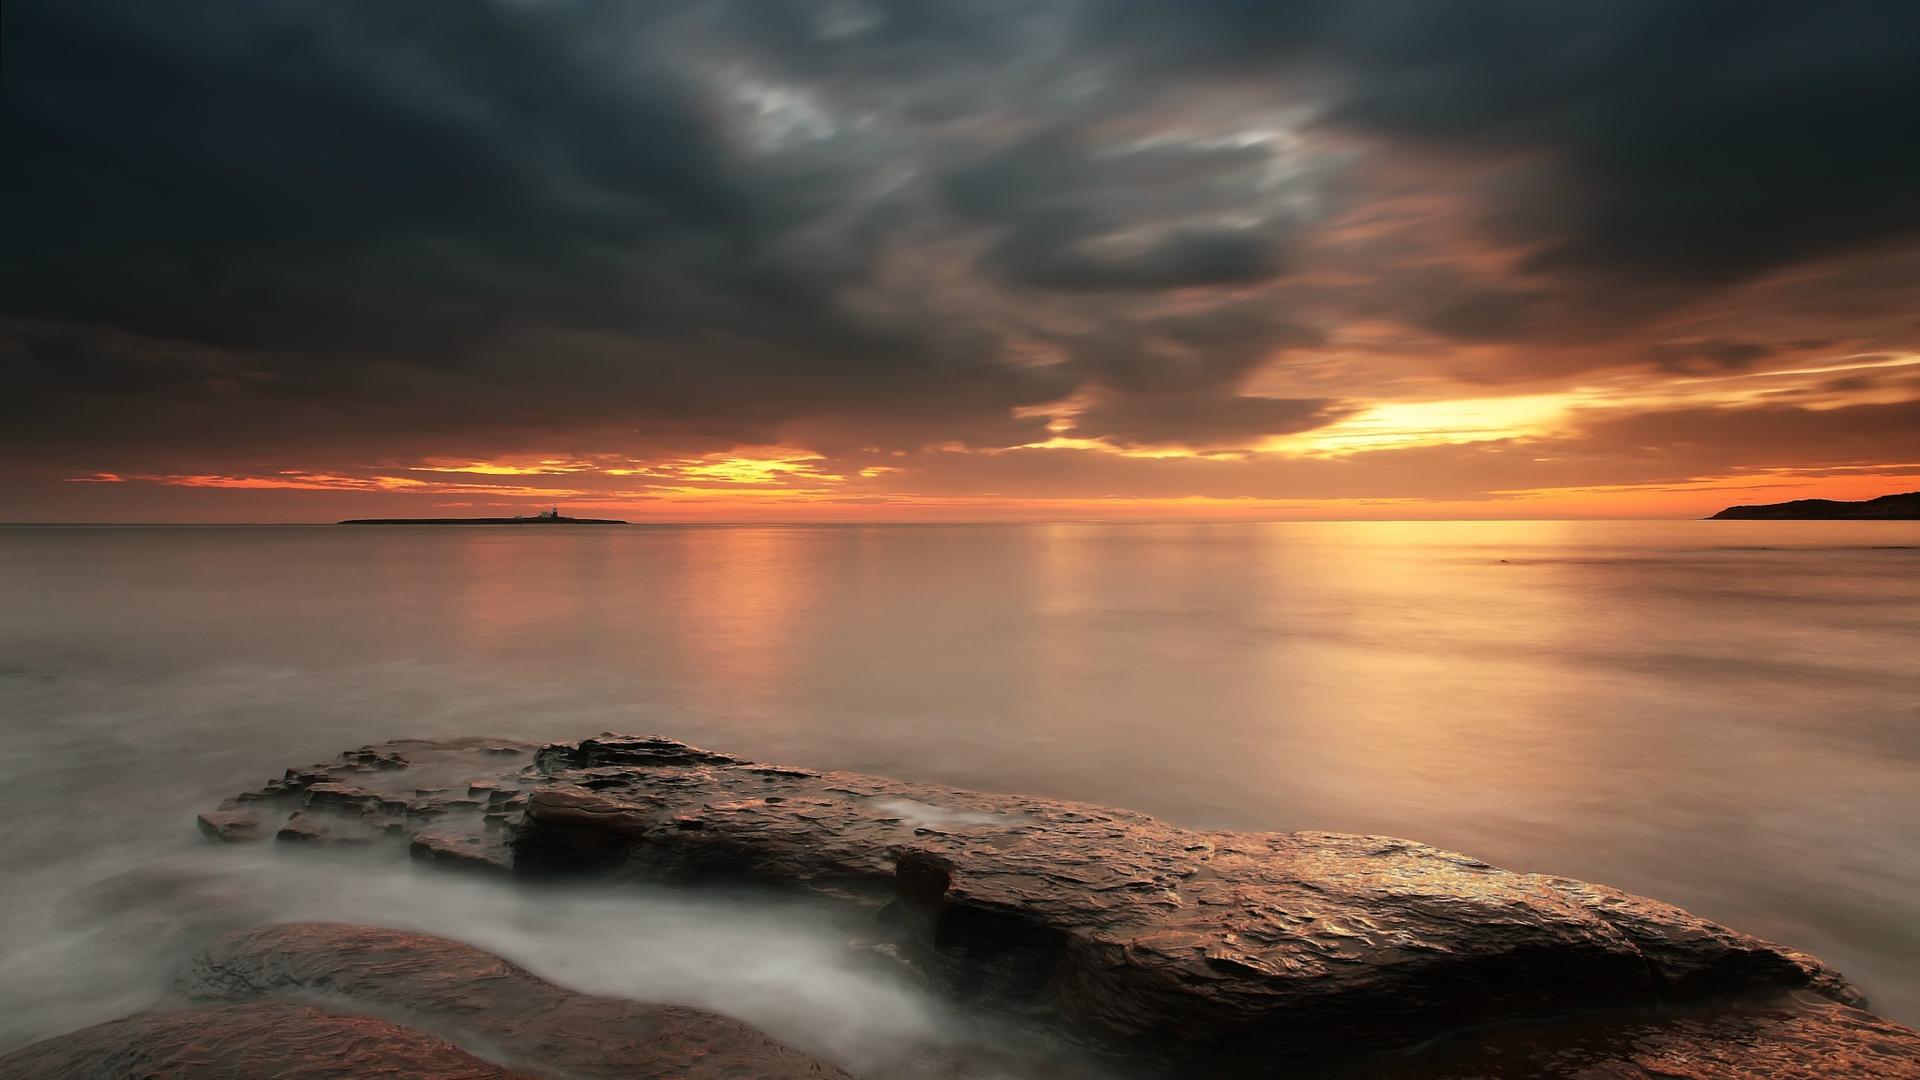 cloudy sunset landscape - high